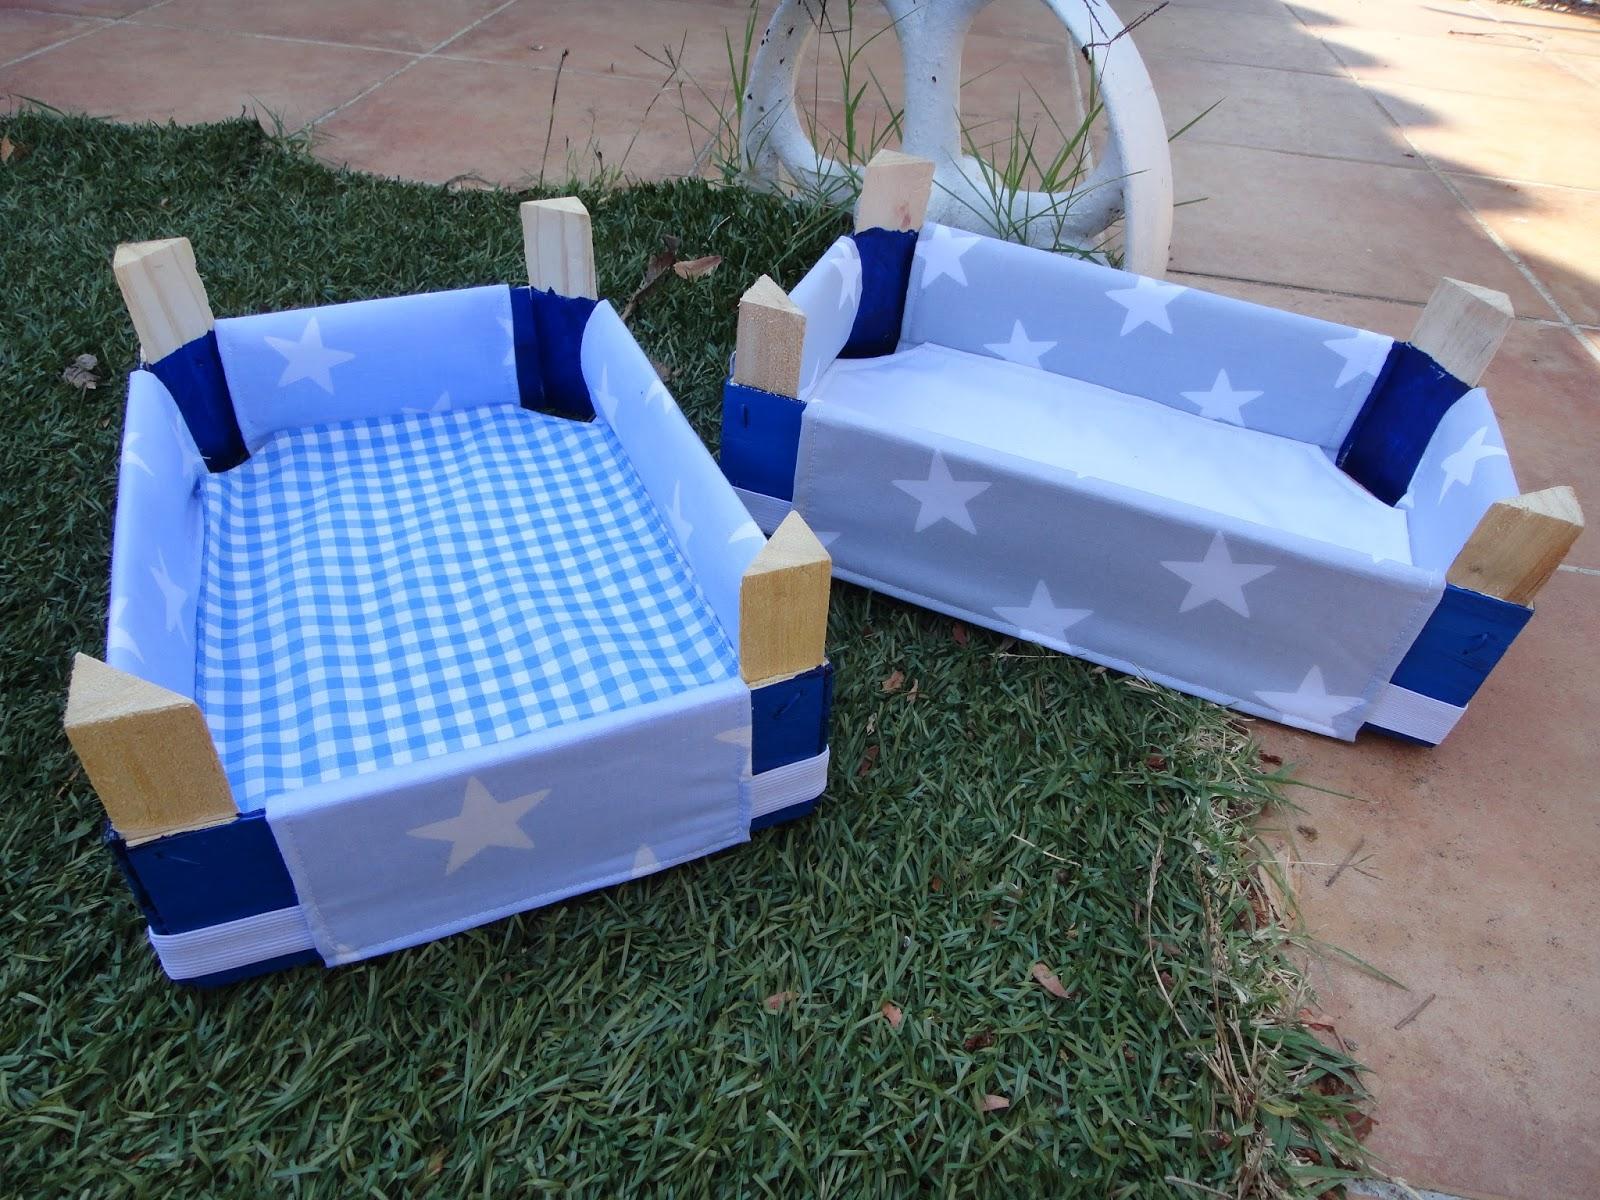 El taller de naid cajas de fresas decoradas con tela for Forrar cajas de carton con tela